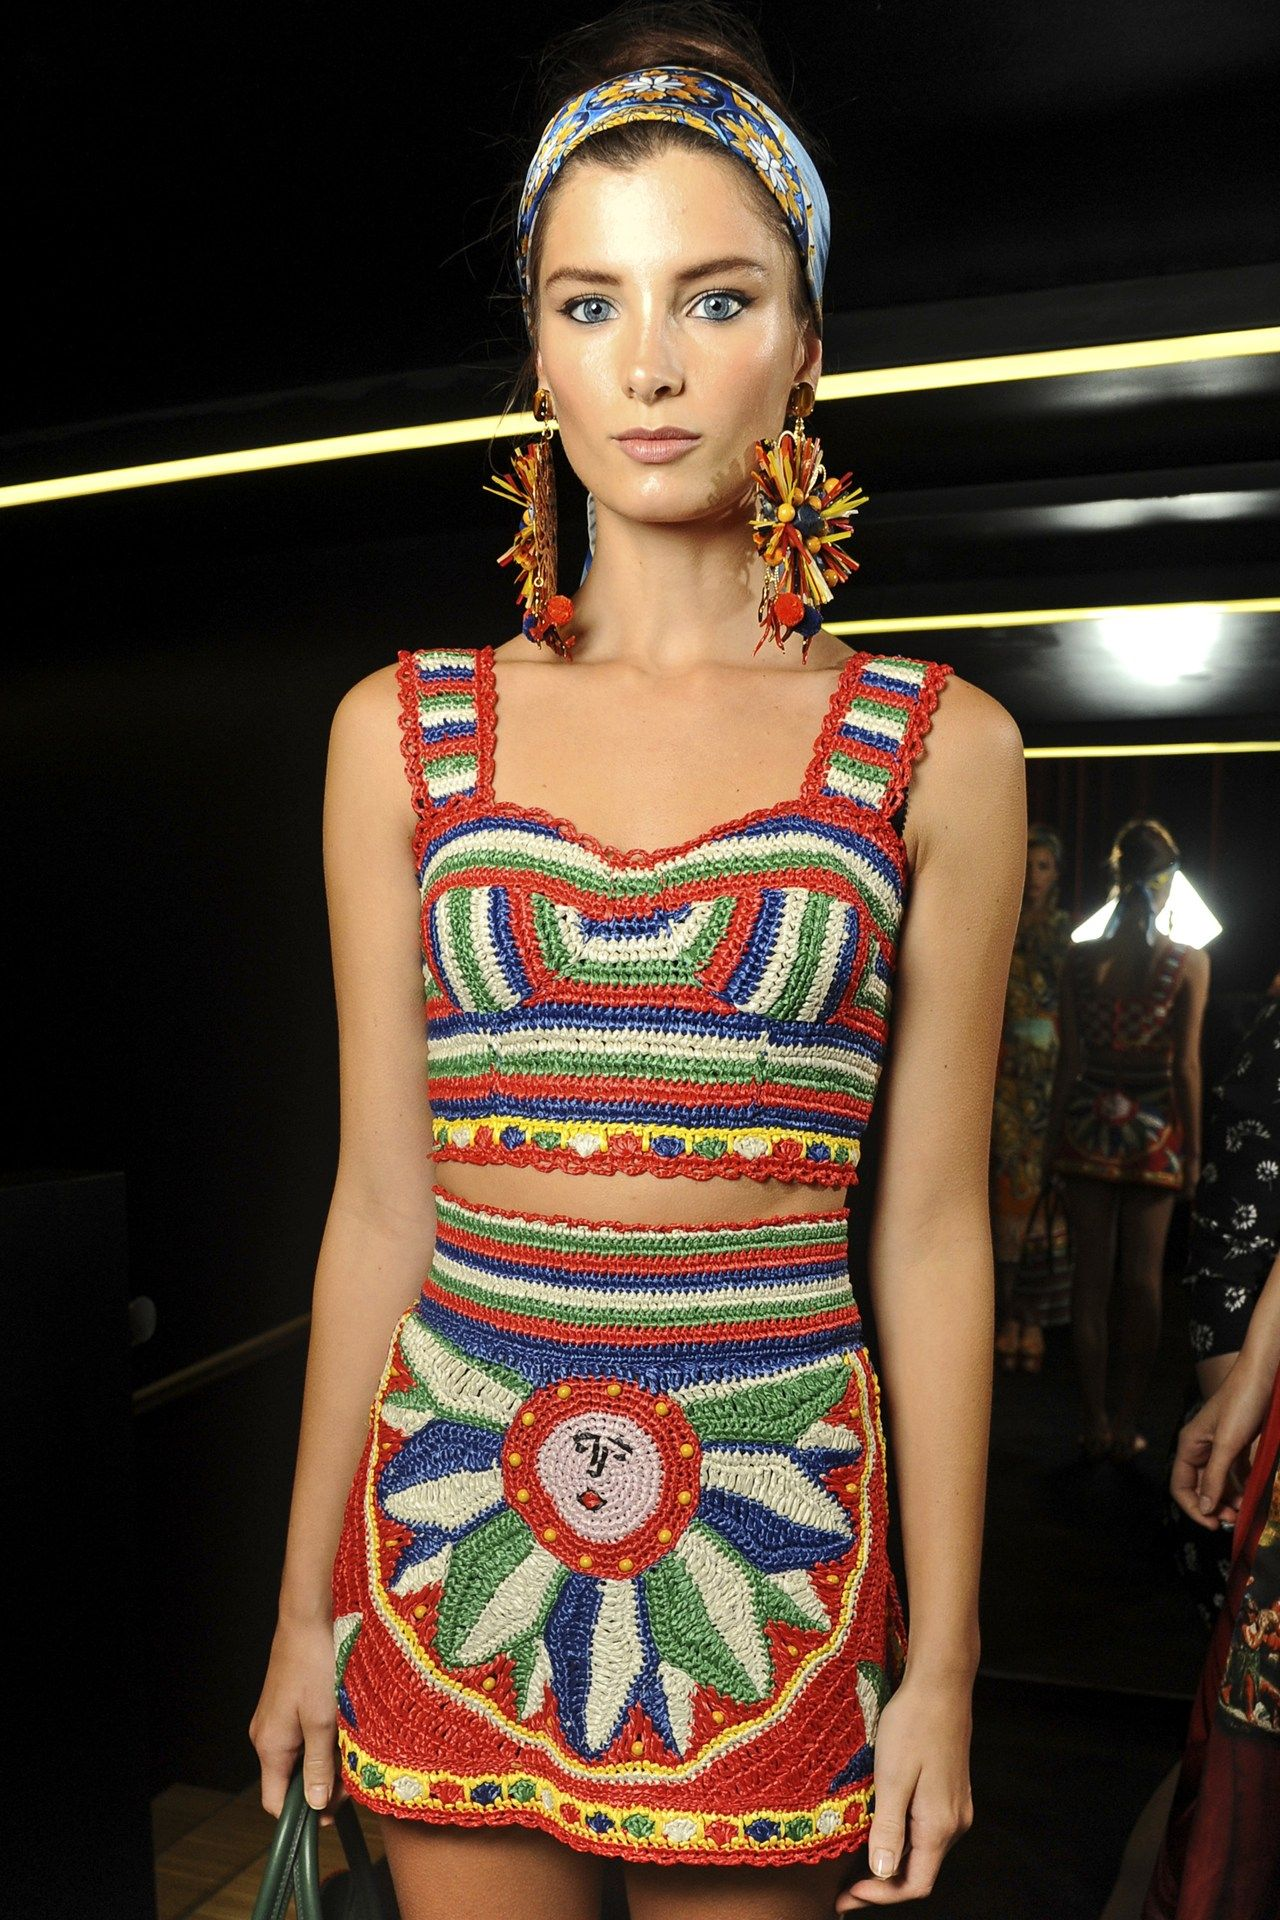 fb head Fashion, Festival fashion women, Dolce and gabbana